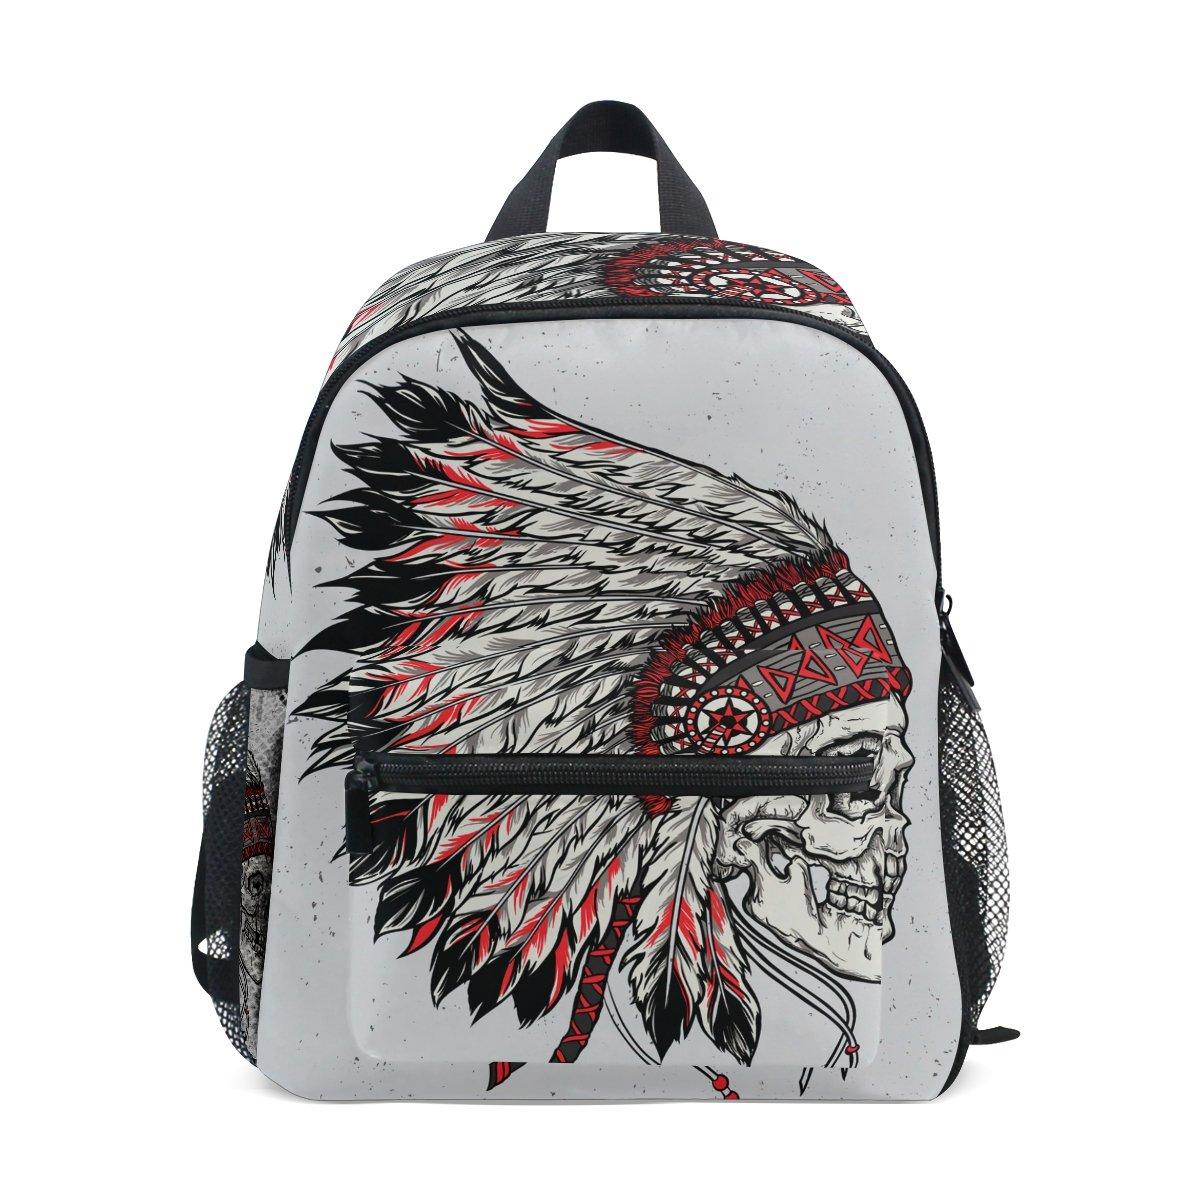 Age 3-8 Native American Indian Art Prints Toddler Preschool Backpack, Children Kids Travel Rucksack Lunch Bags for Boy Girl